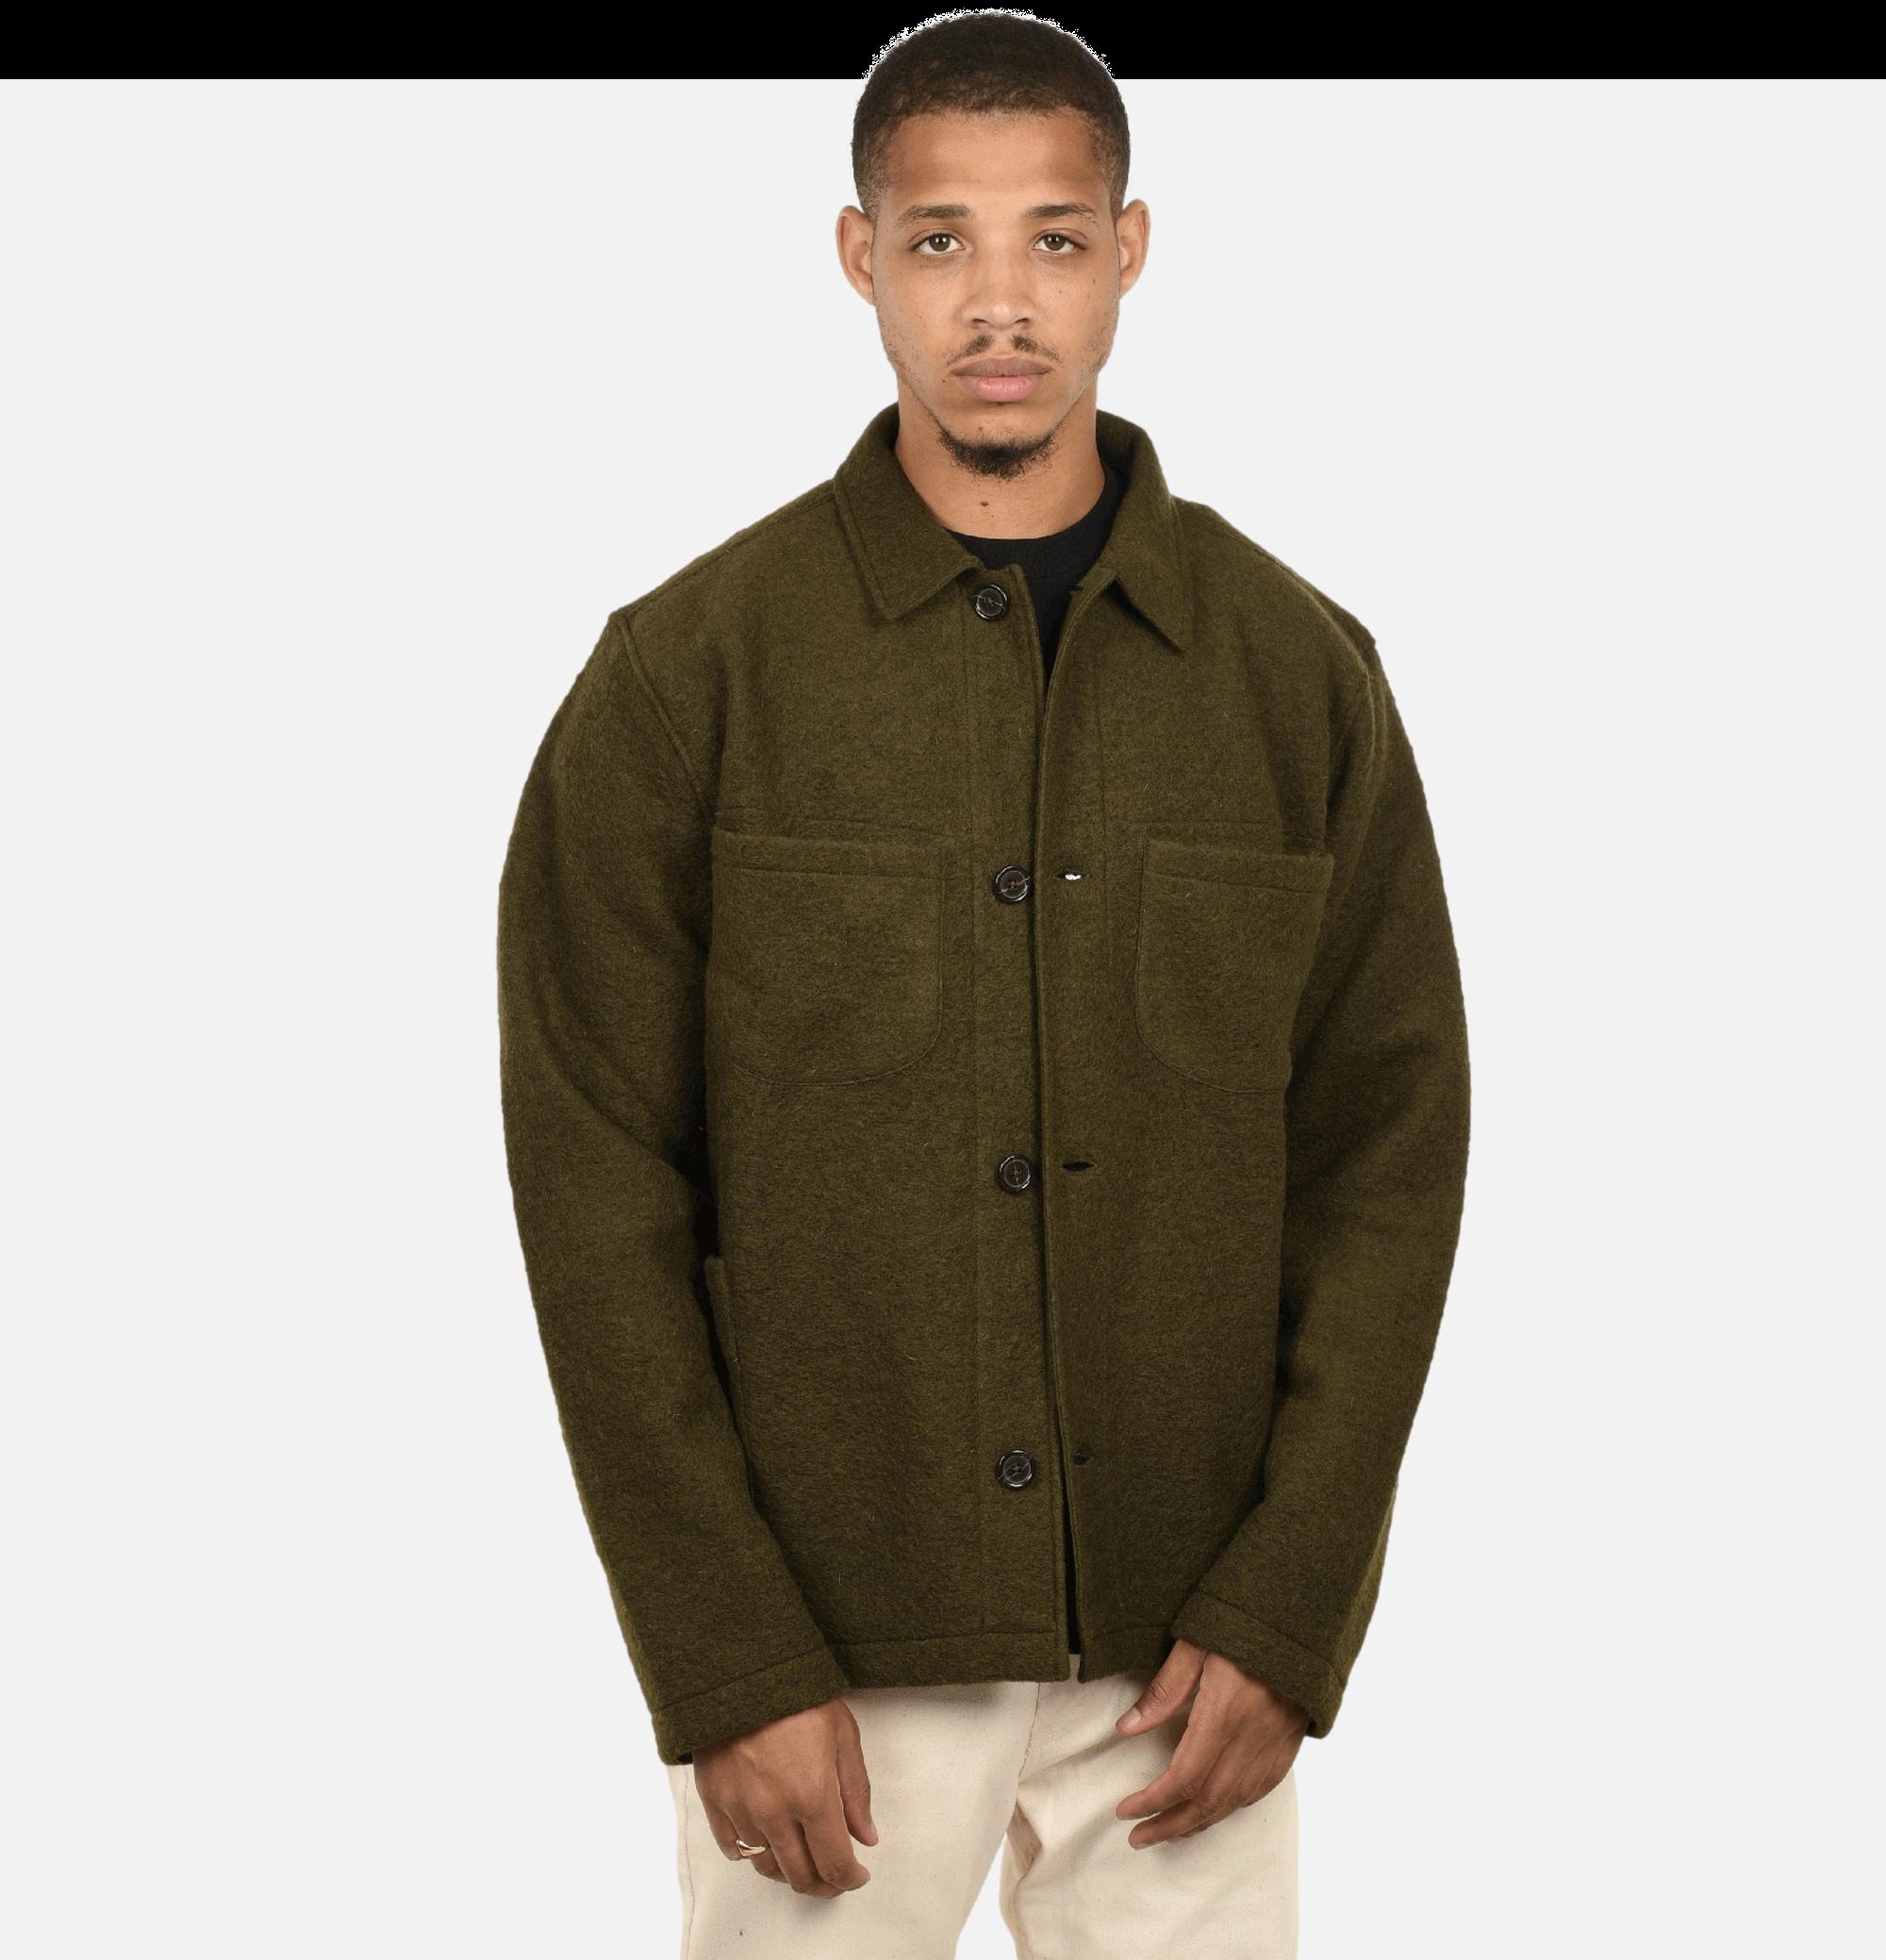 Lumber Jacket Olive Wool...